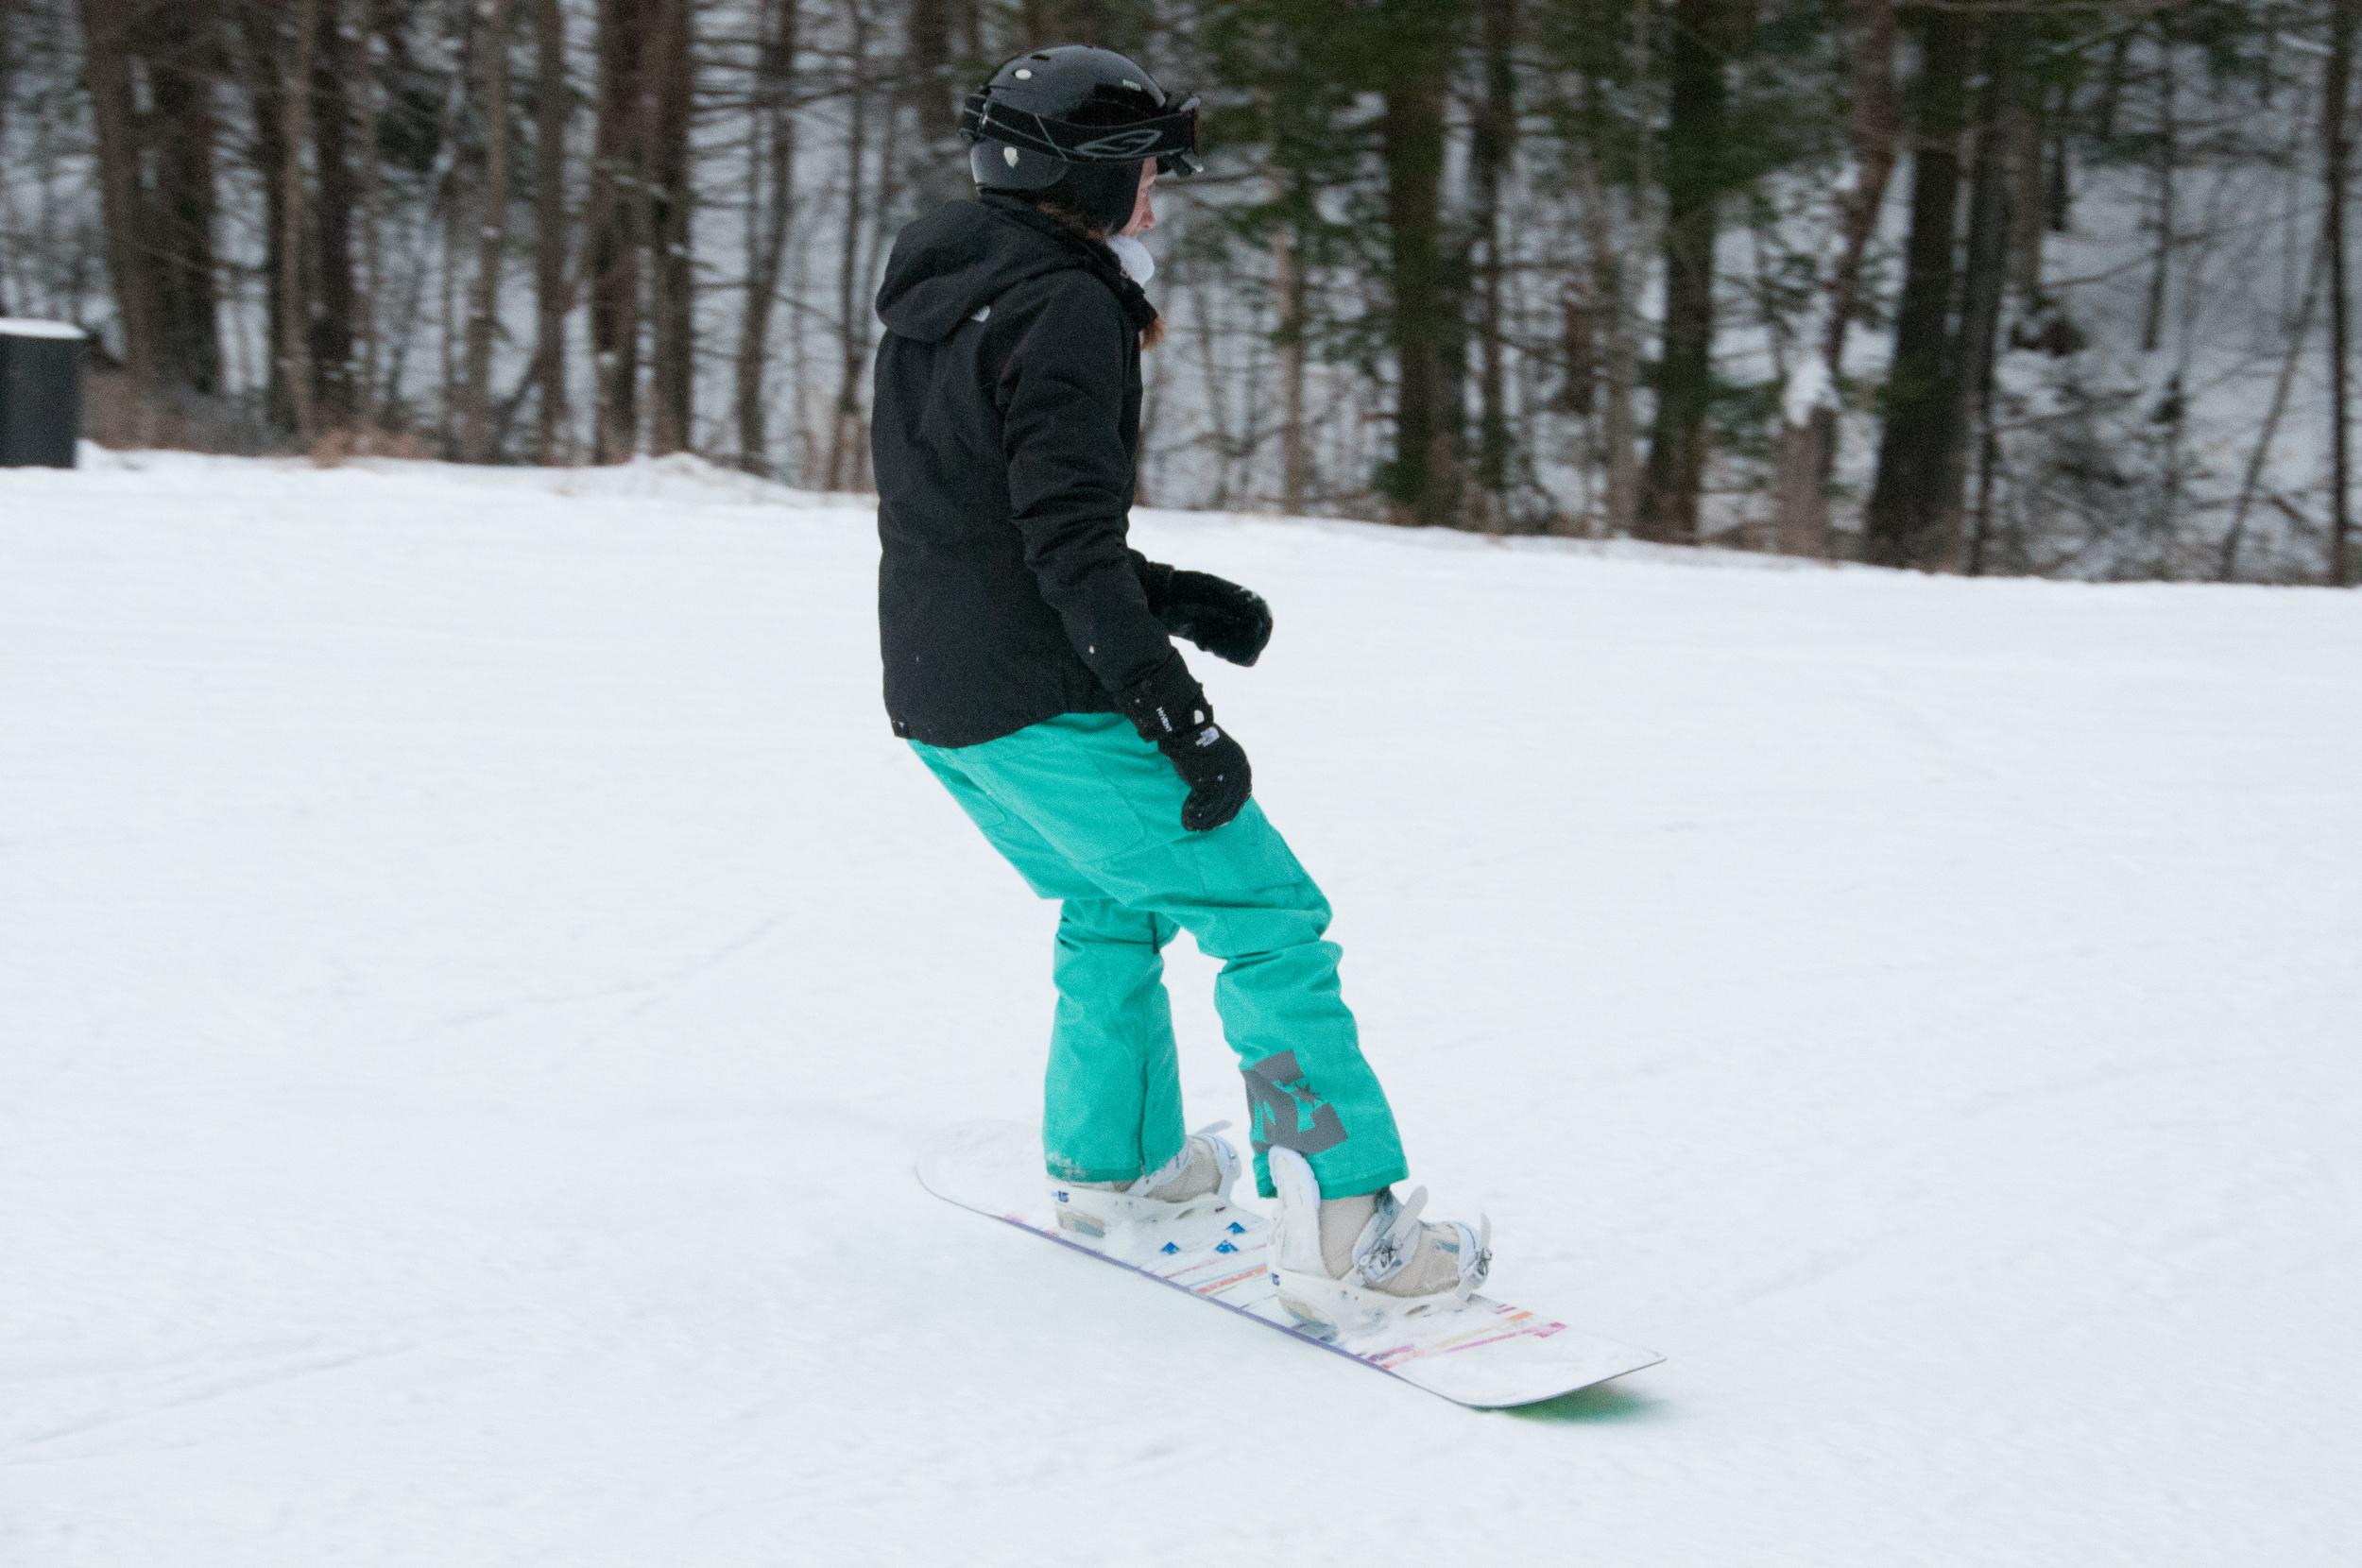 amy snowboarding